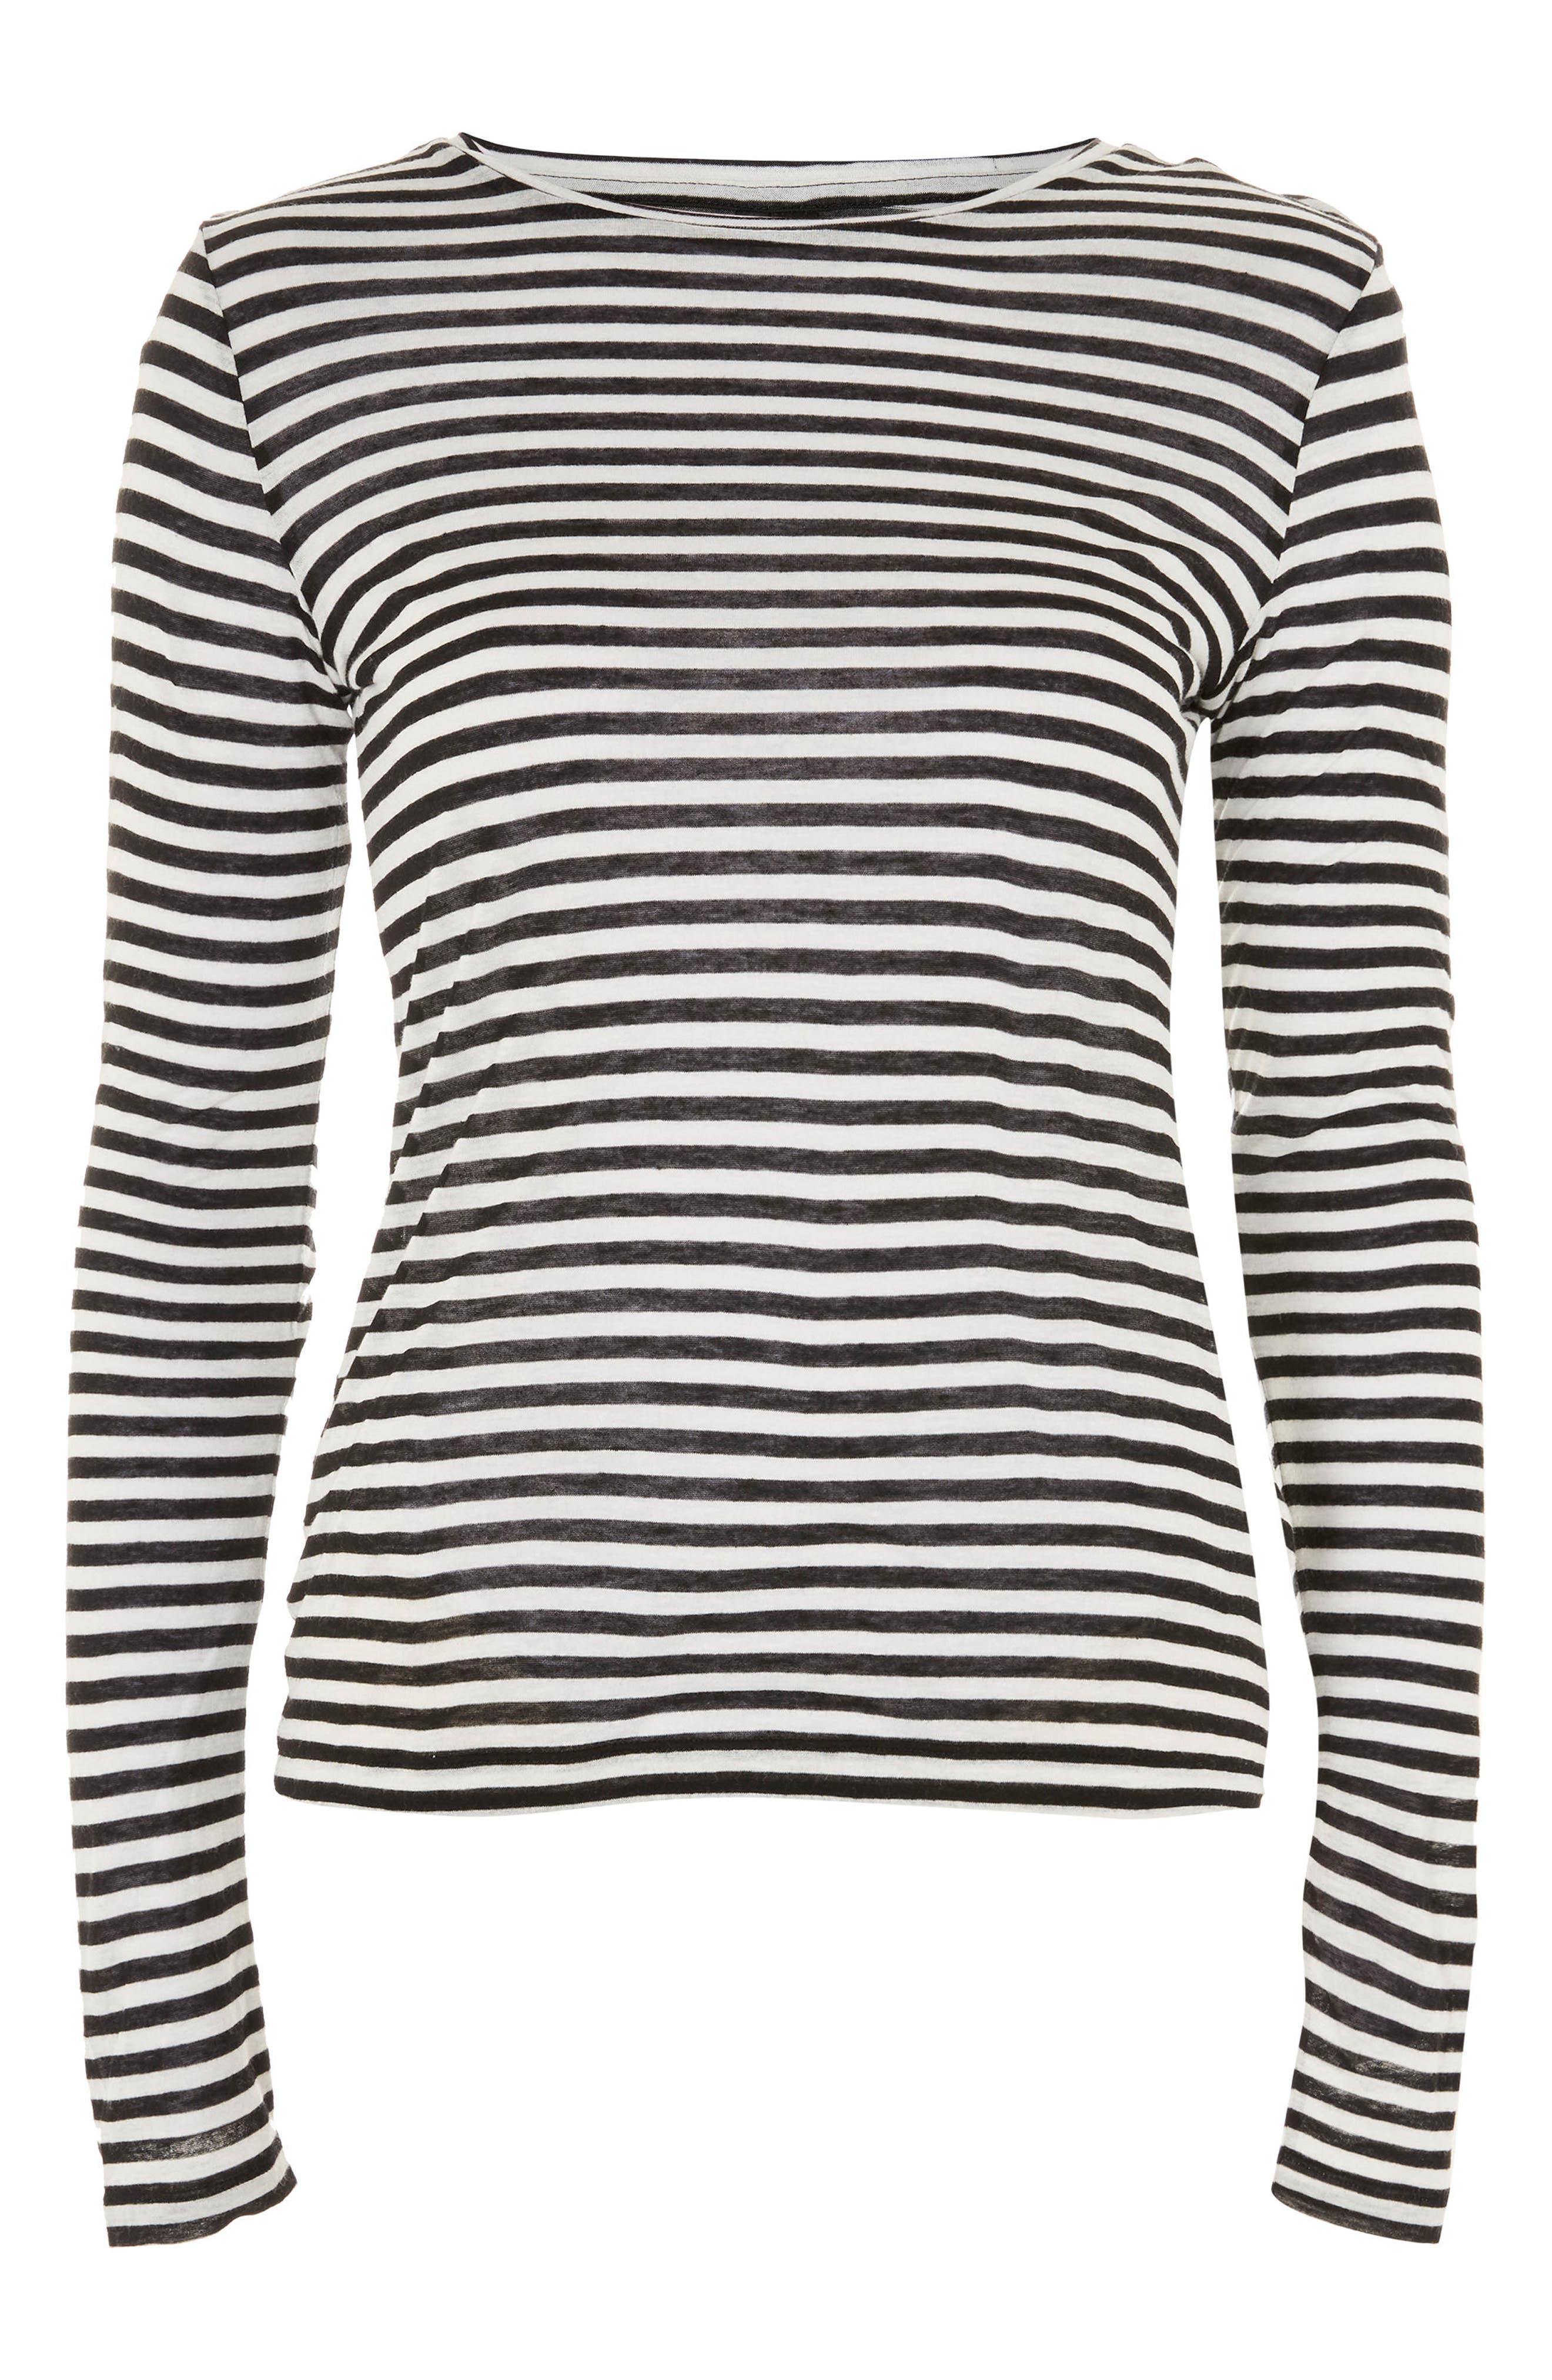 Topshop Stripe Slub Shirt,                         Main,                         color, Black Multi